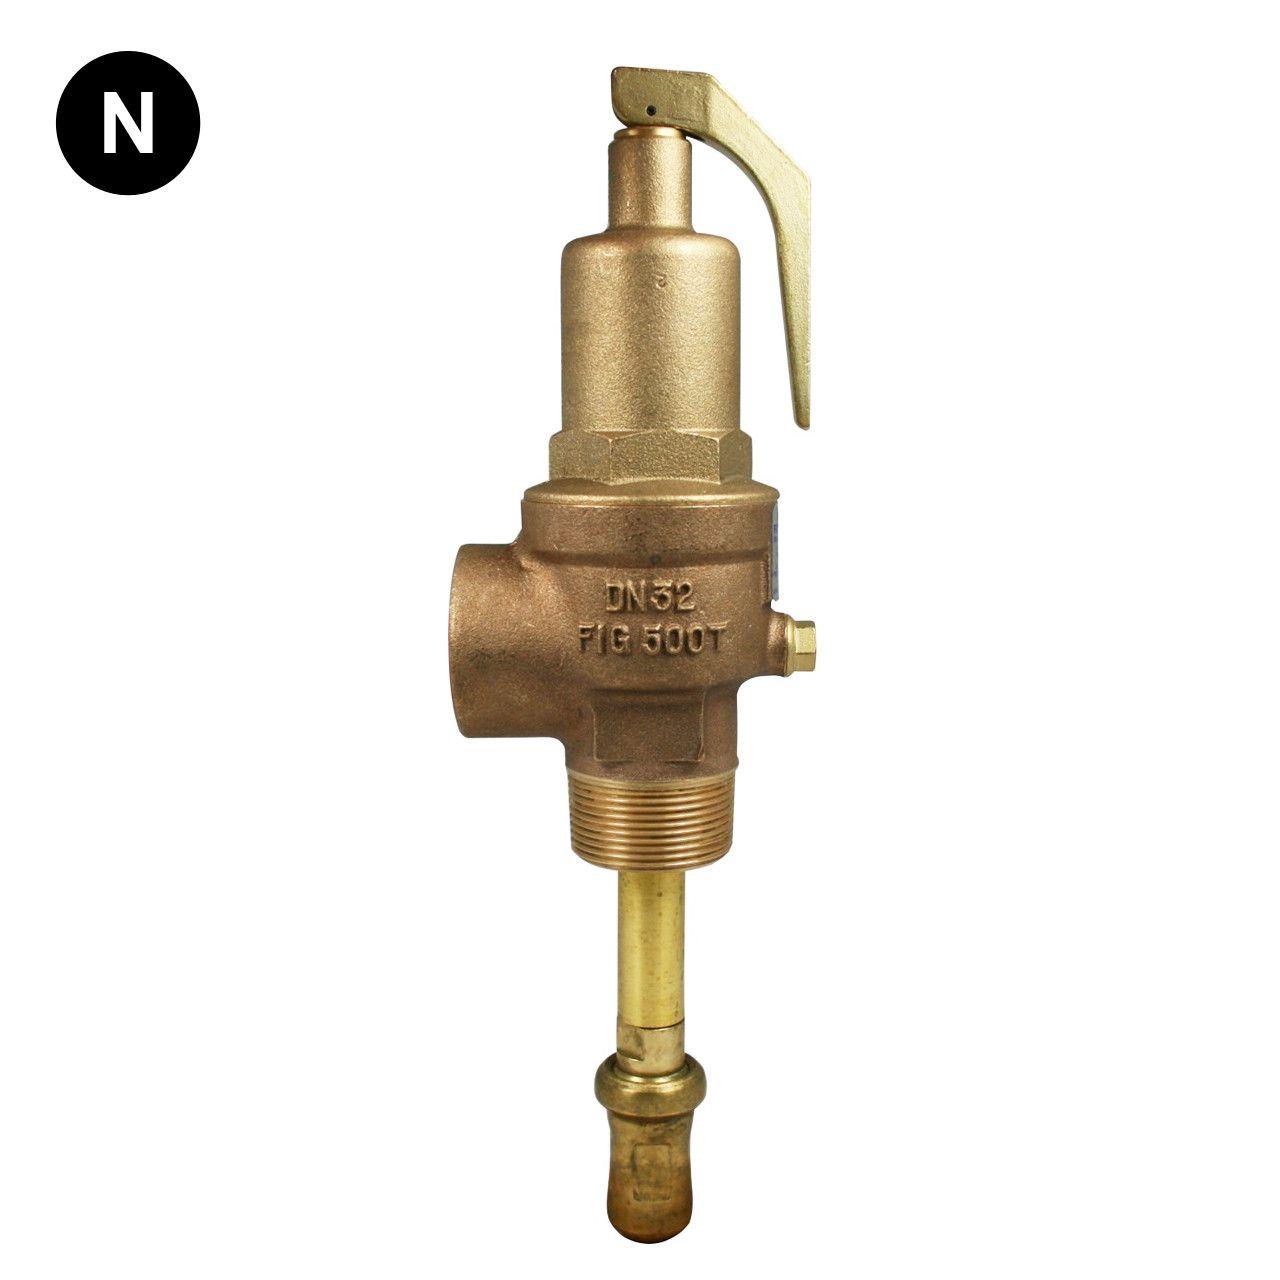 Nabic Fig 500t Combined Pressure Temperature Relief Valve Relief Valve Valve Fig